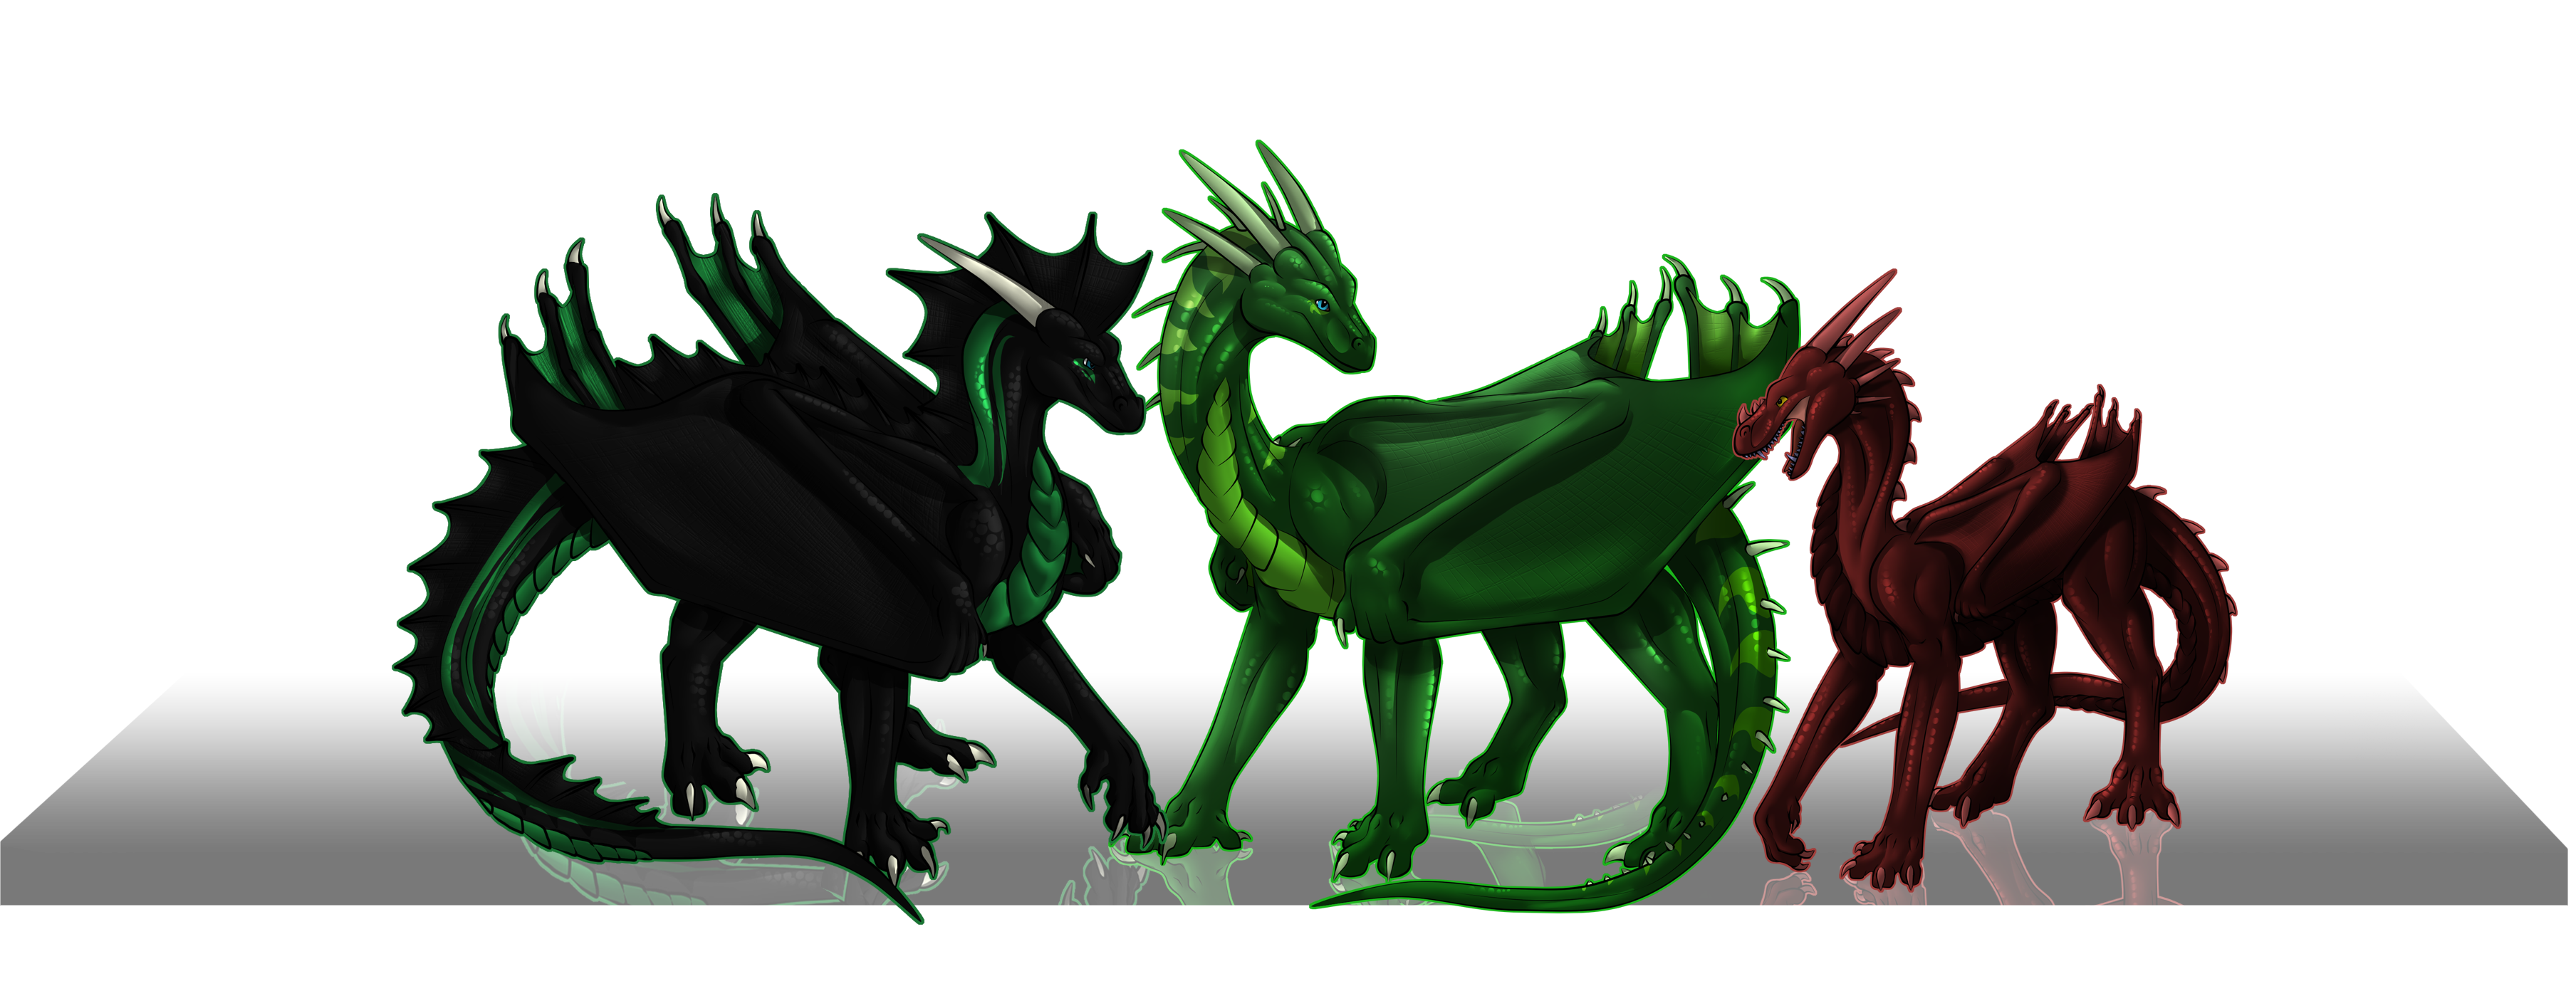 DragonTitle